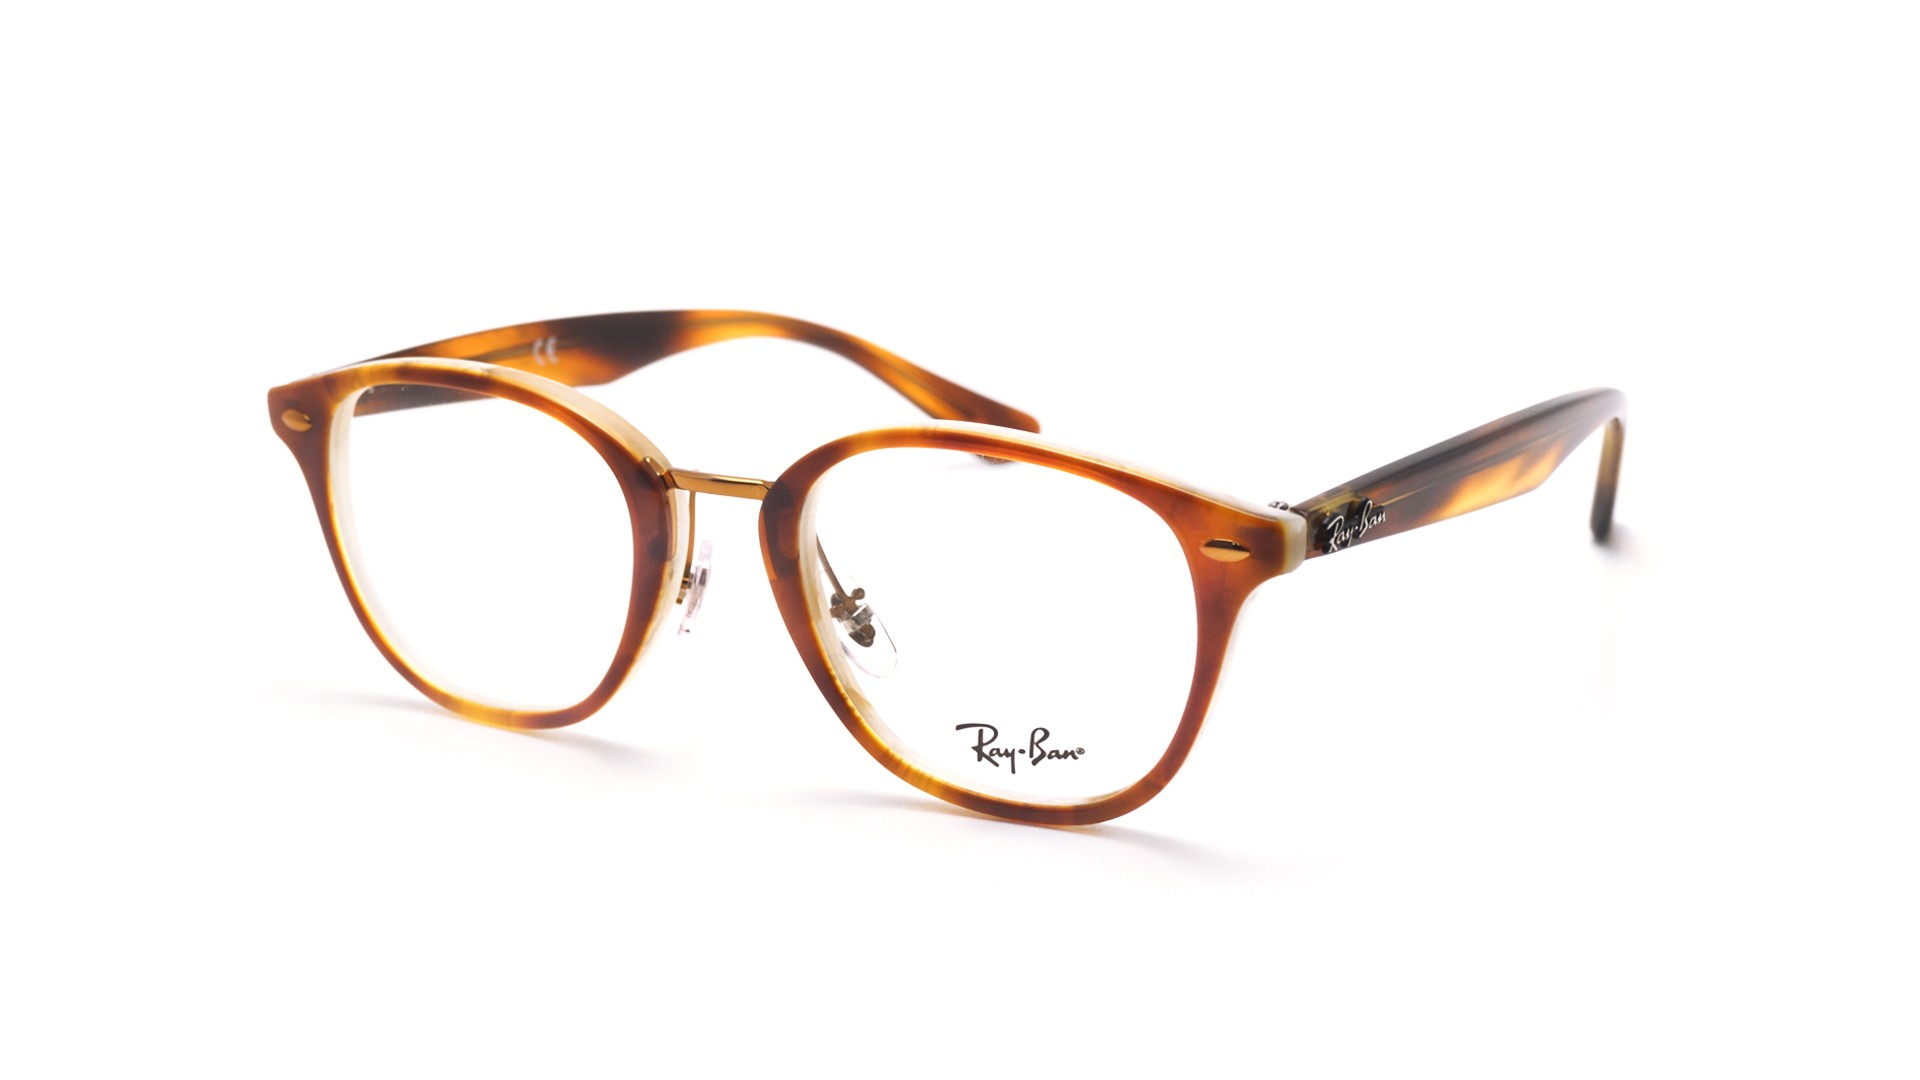 22cdff200ec07 Eyeglasses Ray-Ban RX5355 RB5355 5677 48-21 Tortoise Small